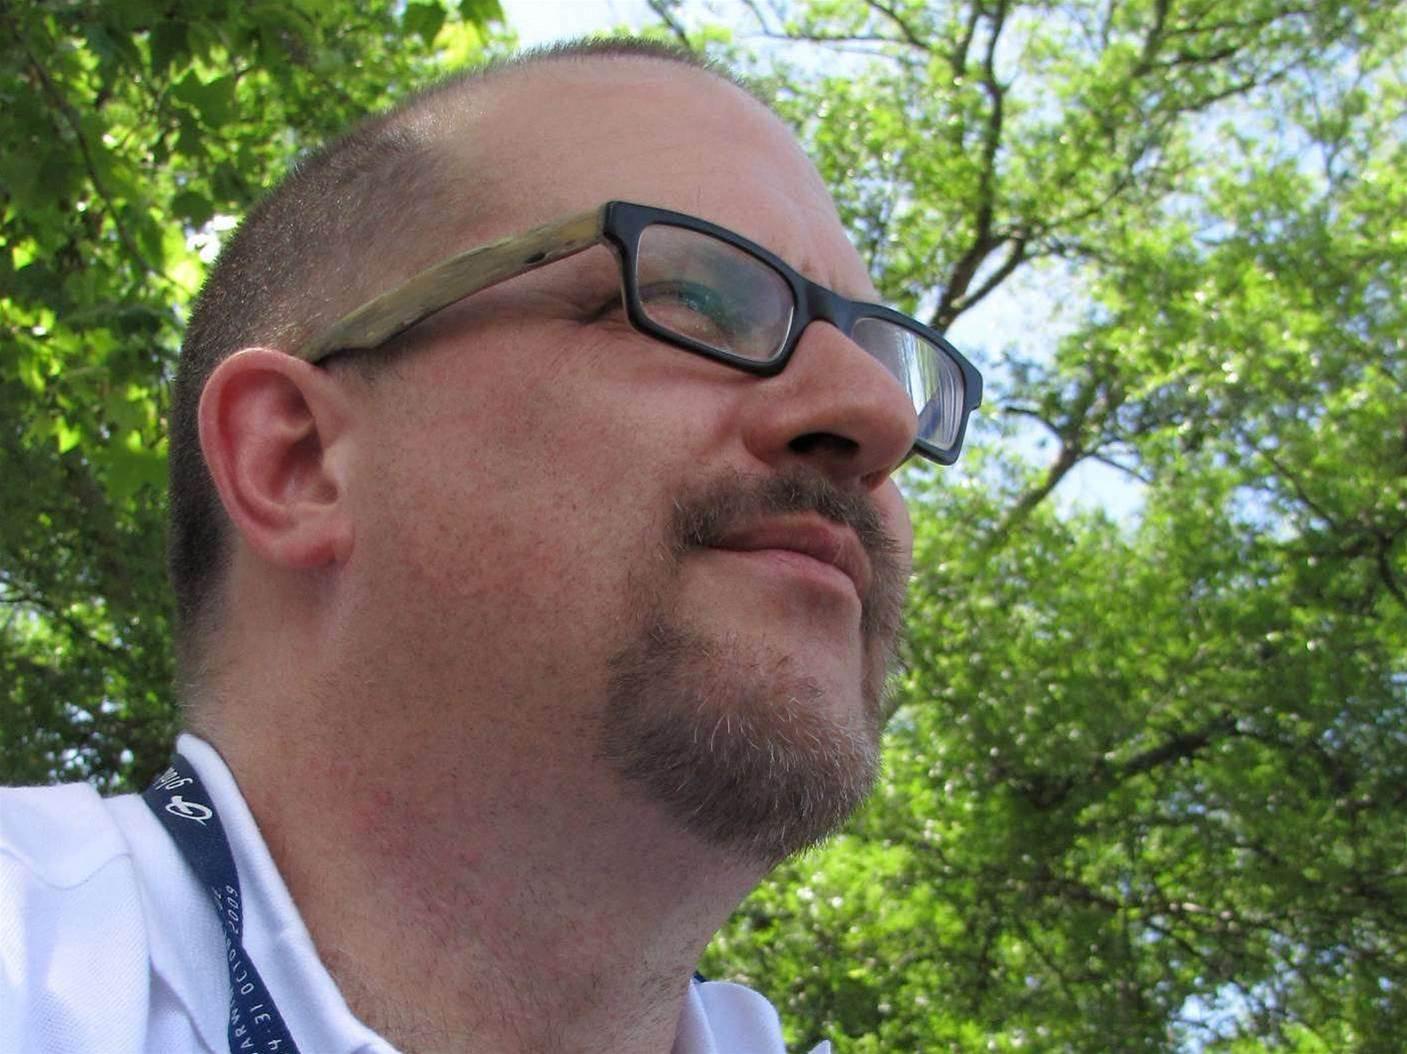 Internode reveals Naked terabyte plan